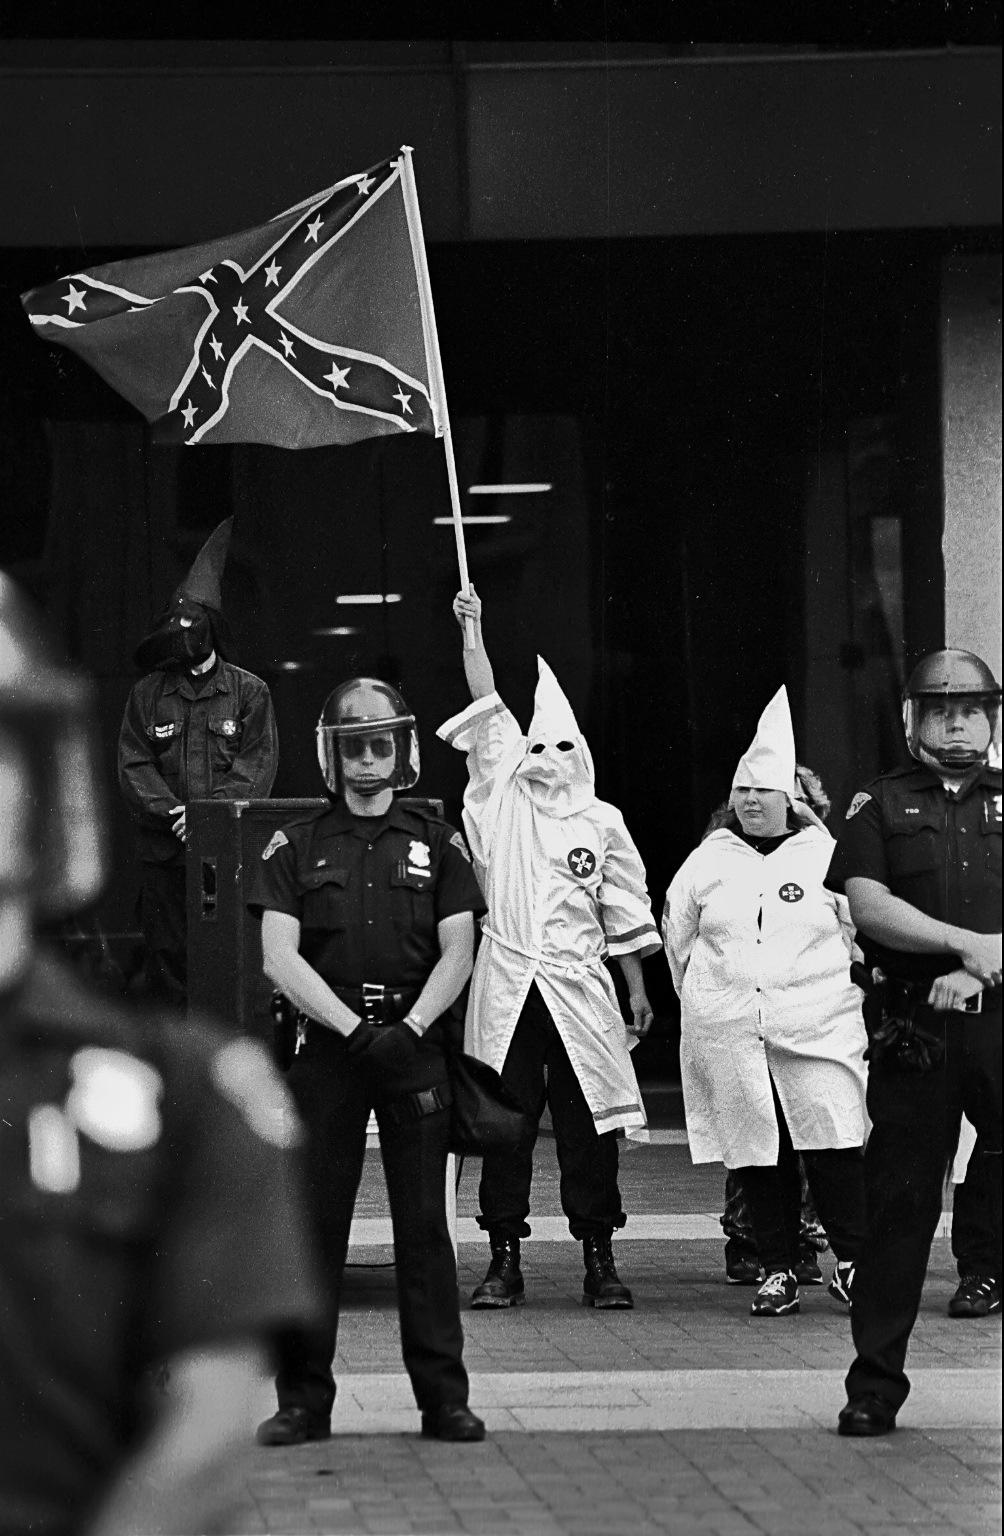 KKK RALLY IN CLEVELAND,OH 1999 by Walter Novak